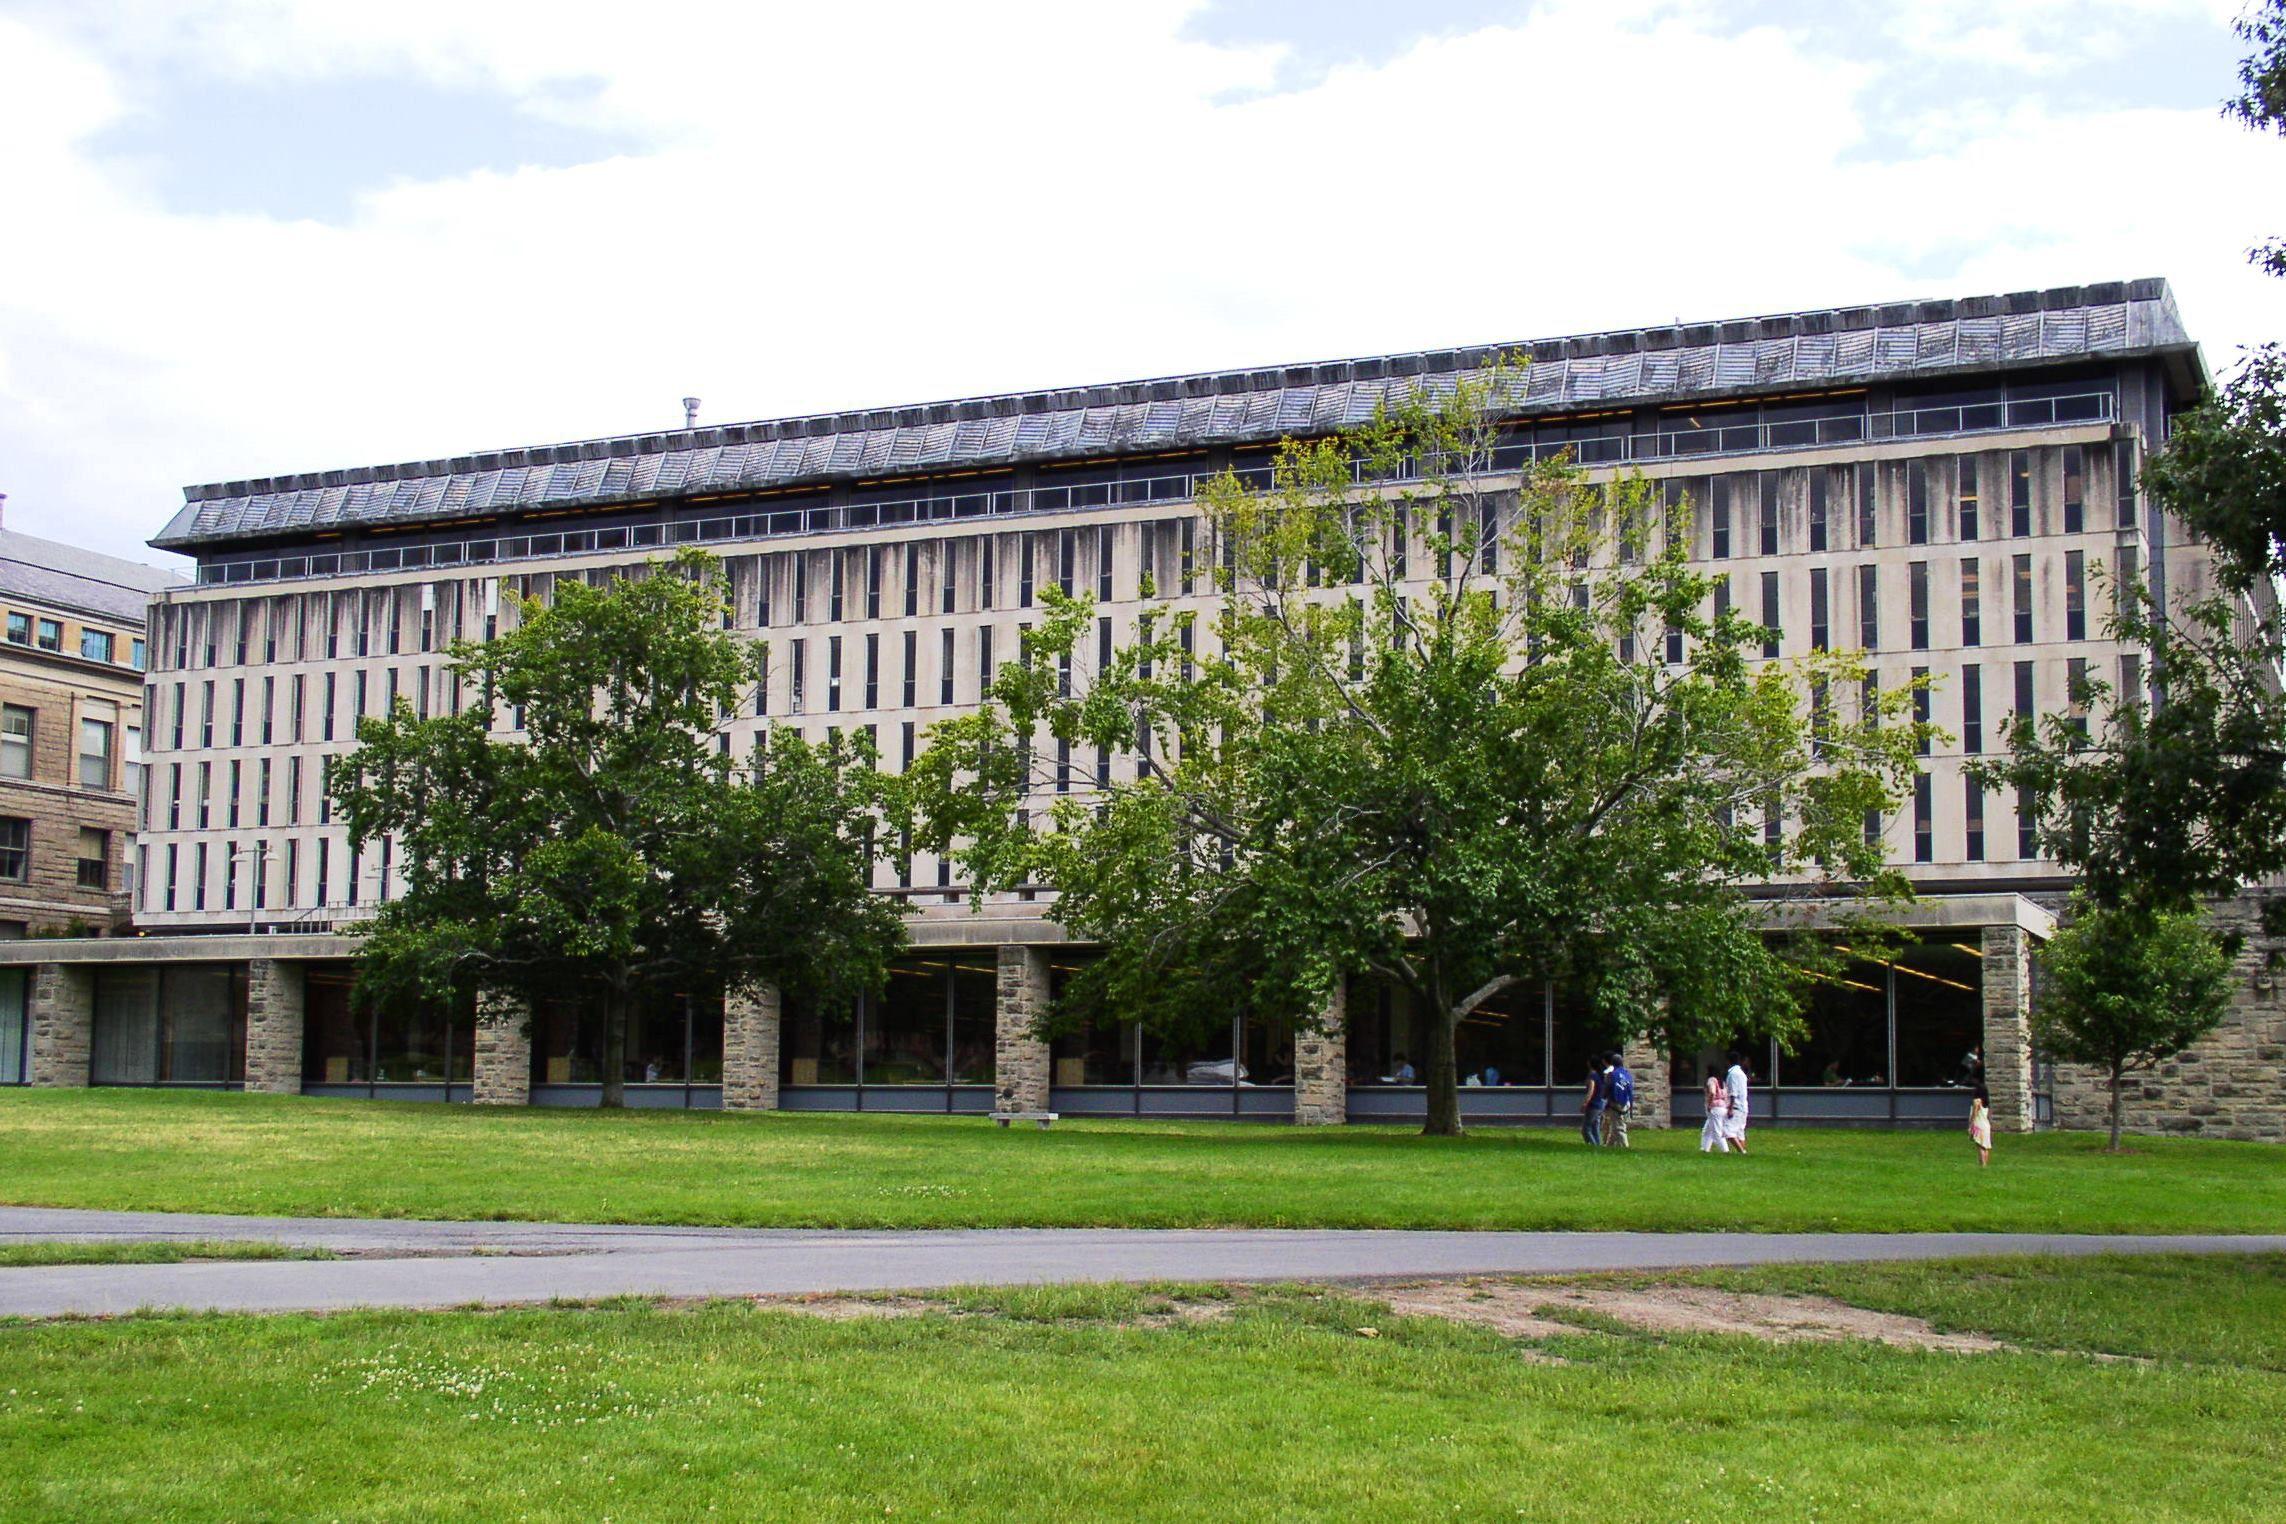 Cornell University Olin Library